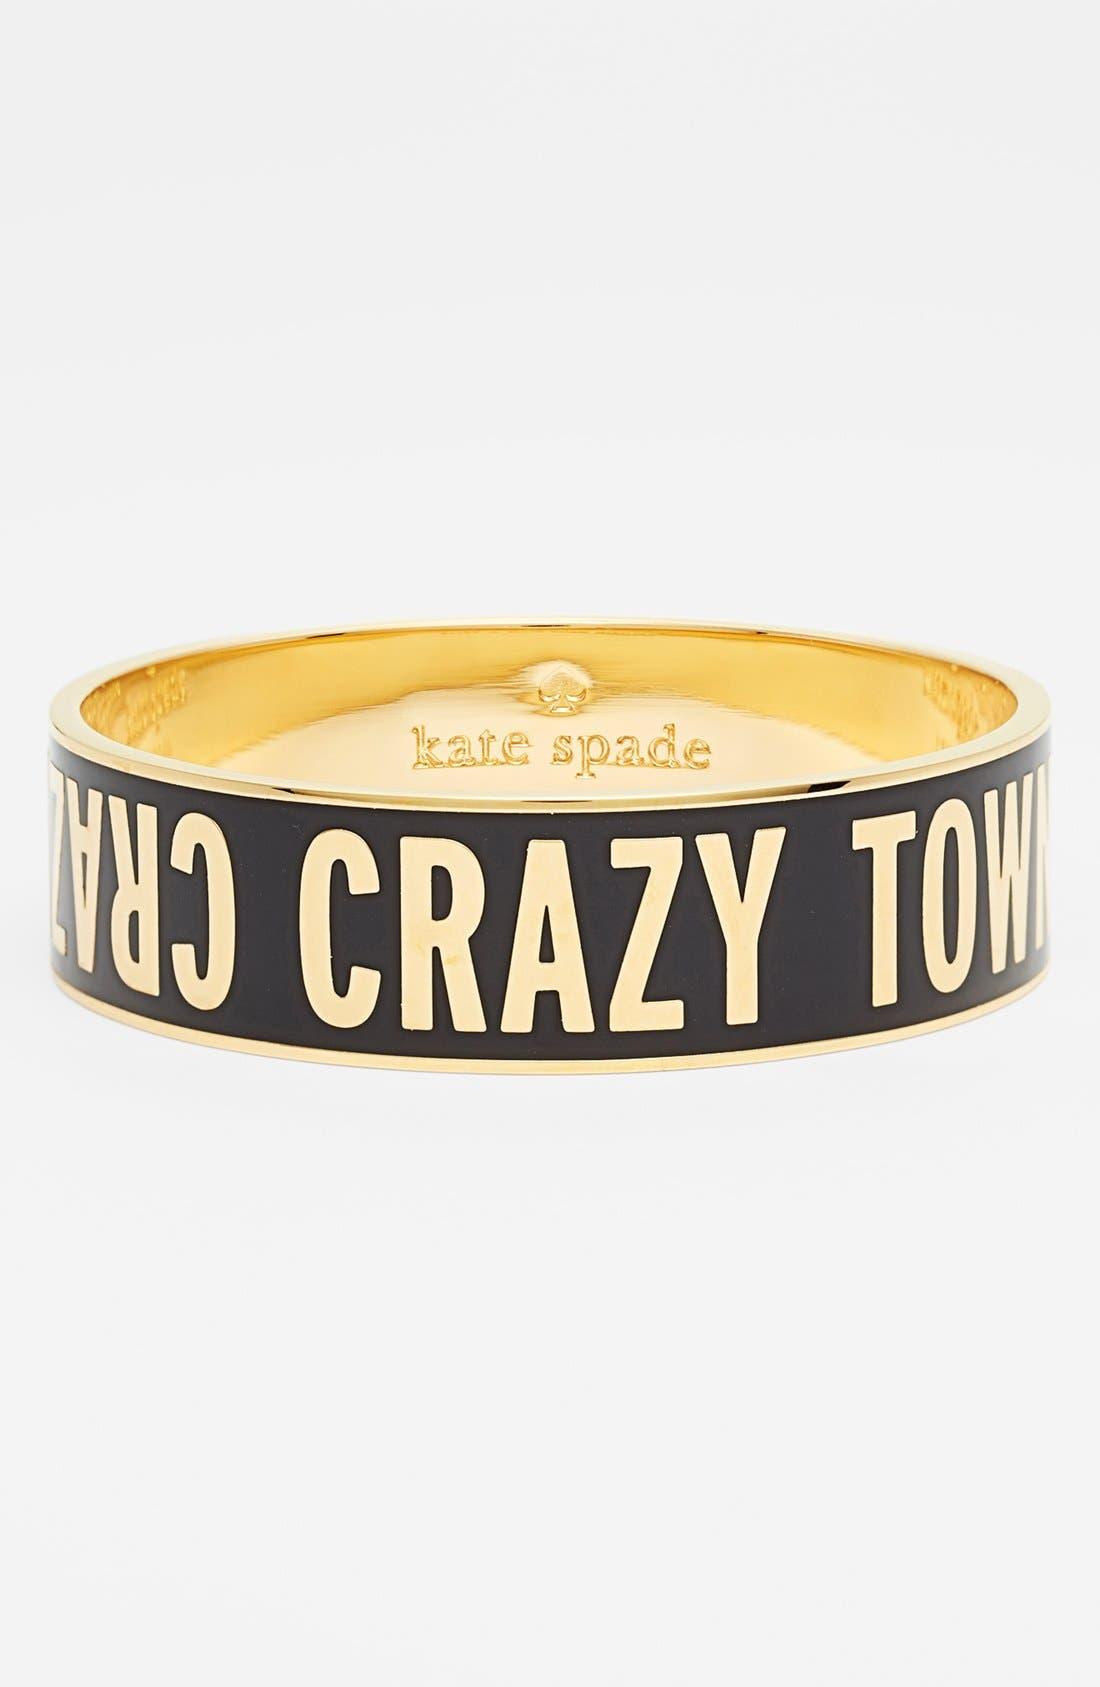 Alternate Image 1 Selected - kate spade new york 'idiom - crazy town' bangle